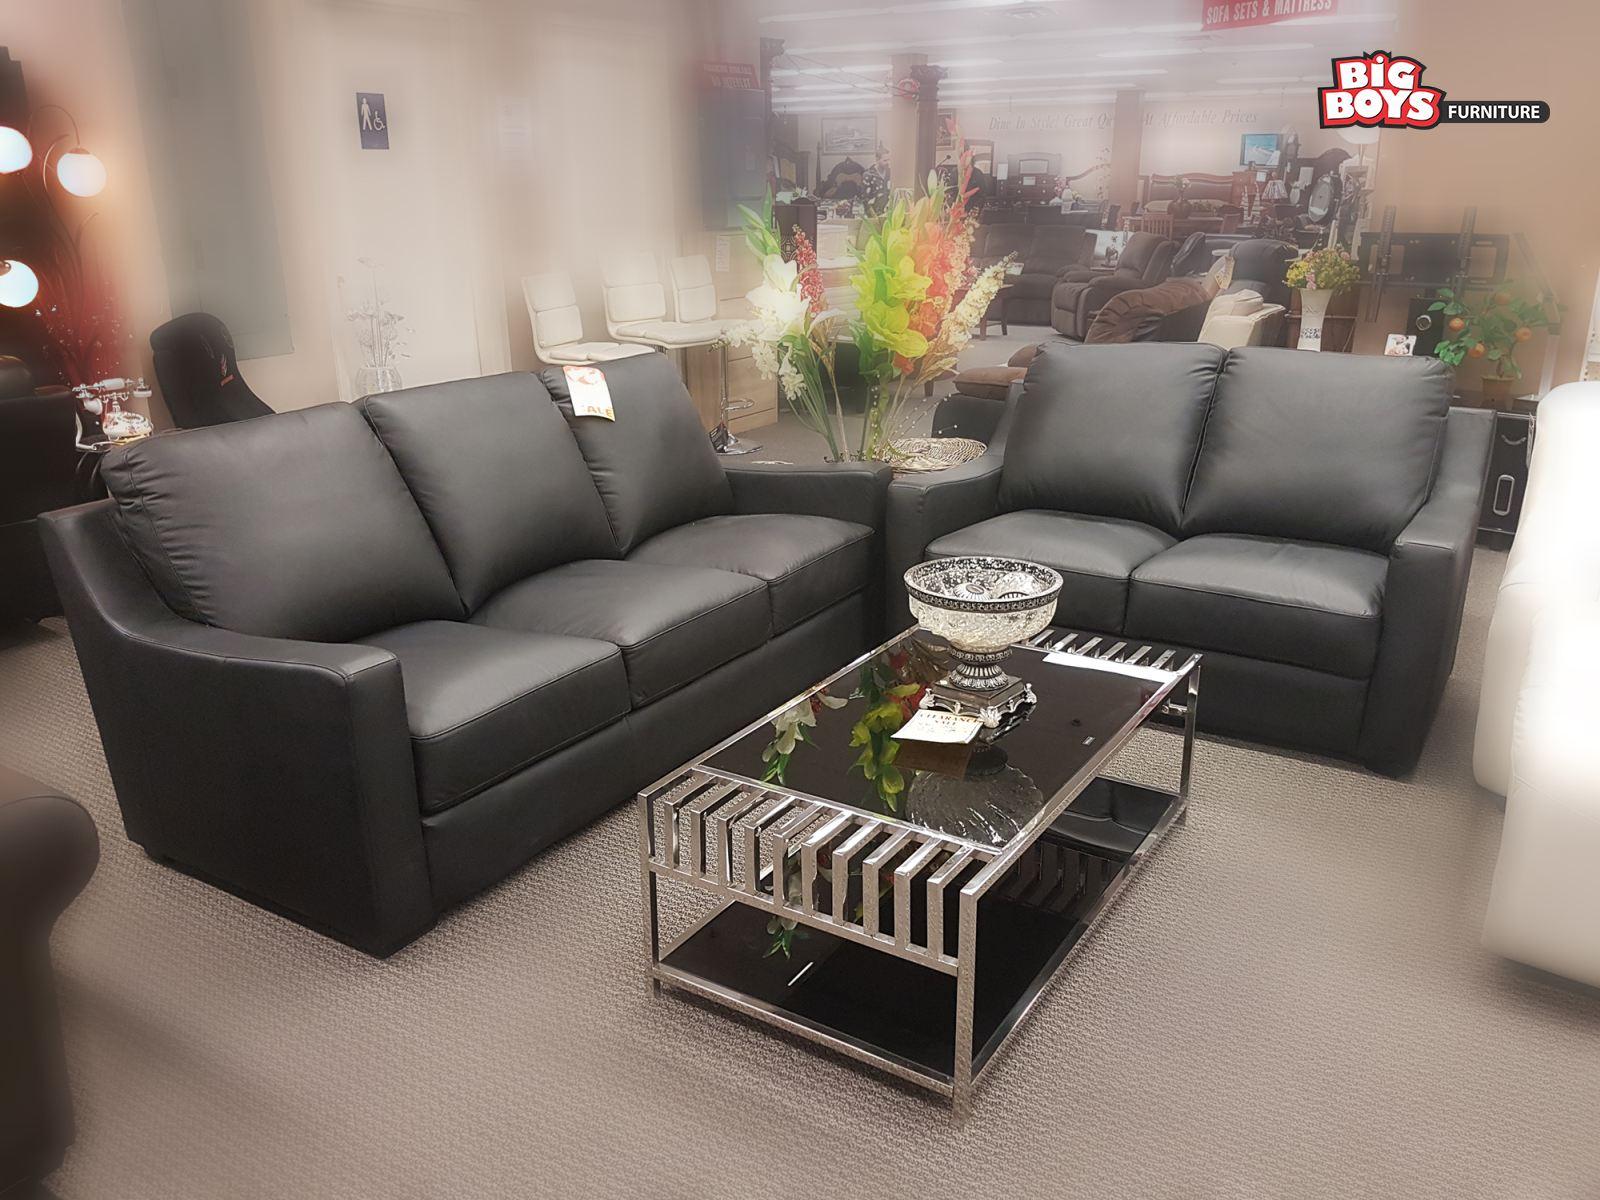 Black sofa sets in different designs